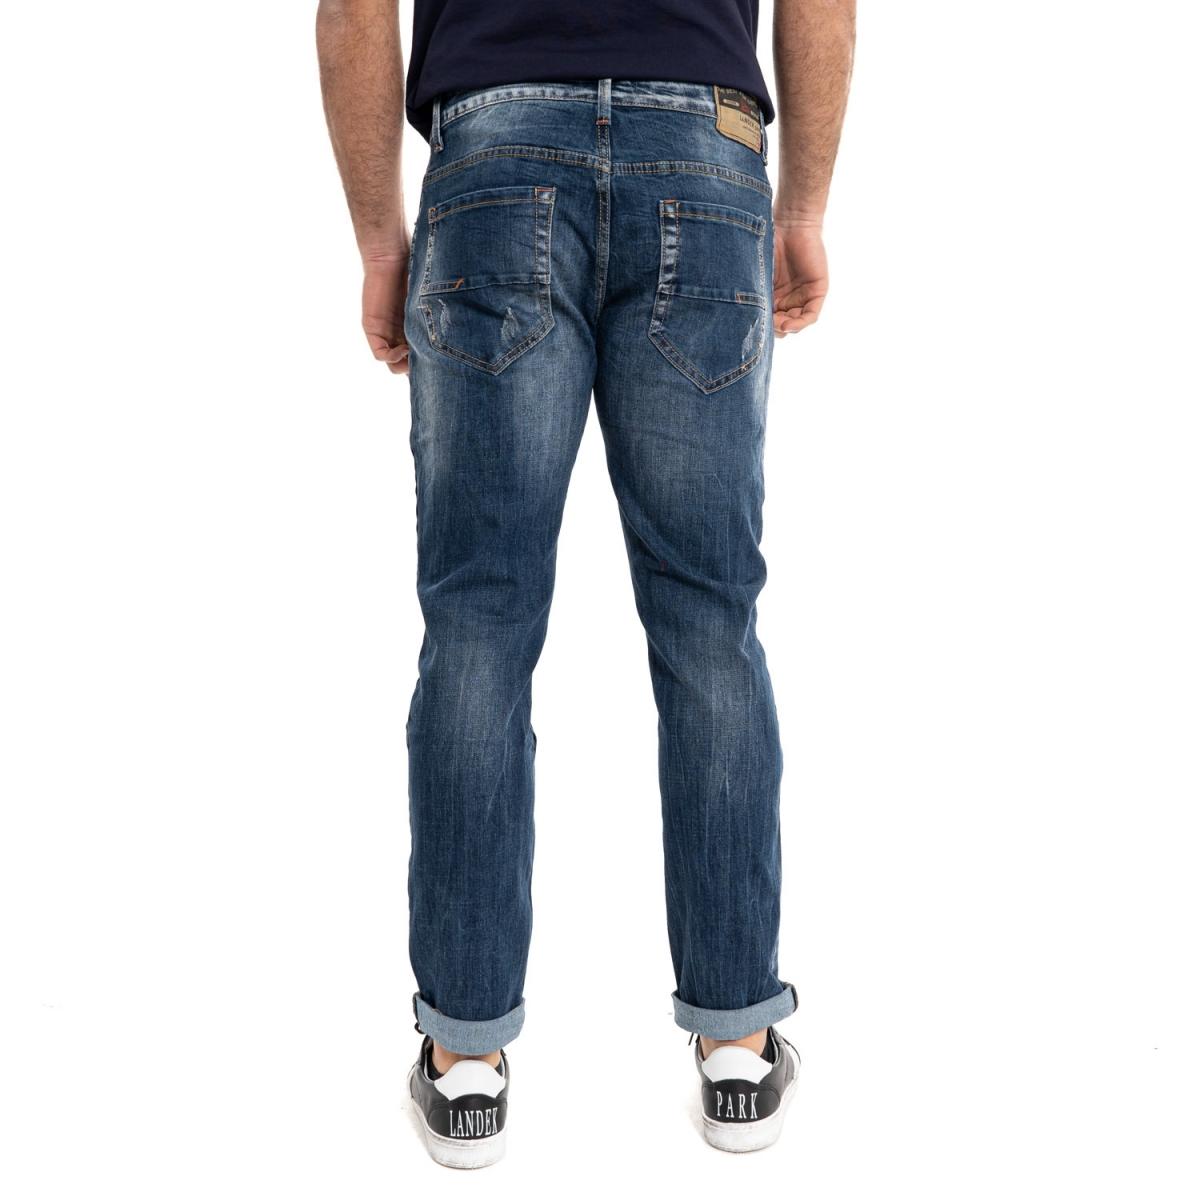 Kleidung Jeans mann Jeans LPHM1075 LANDEK PARK Cafedelmar Shop